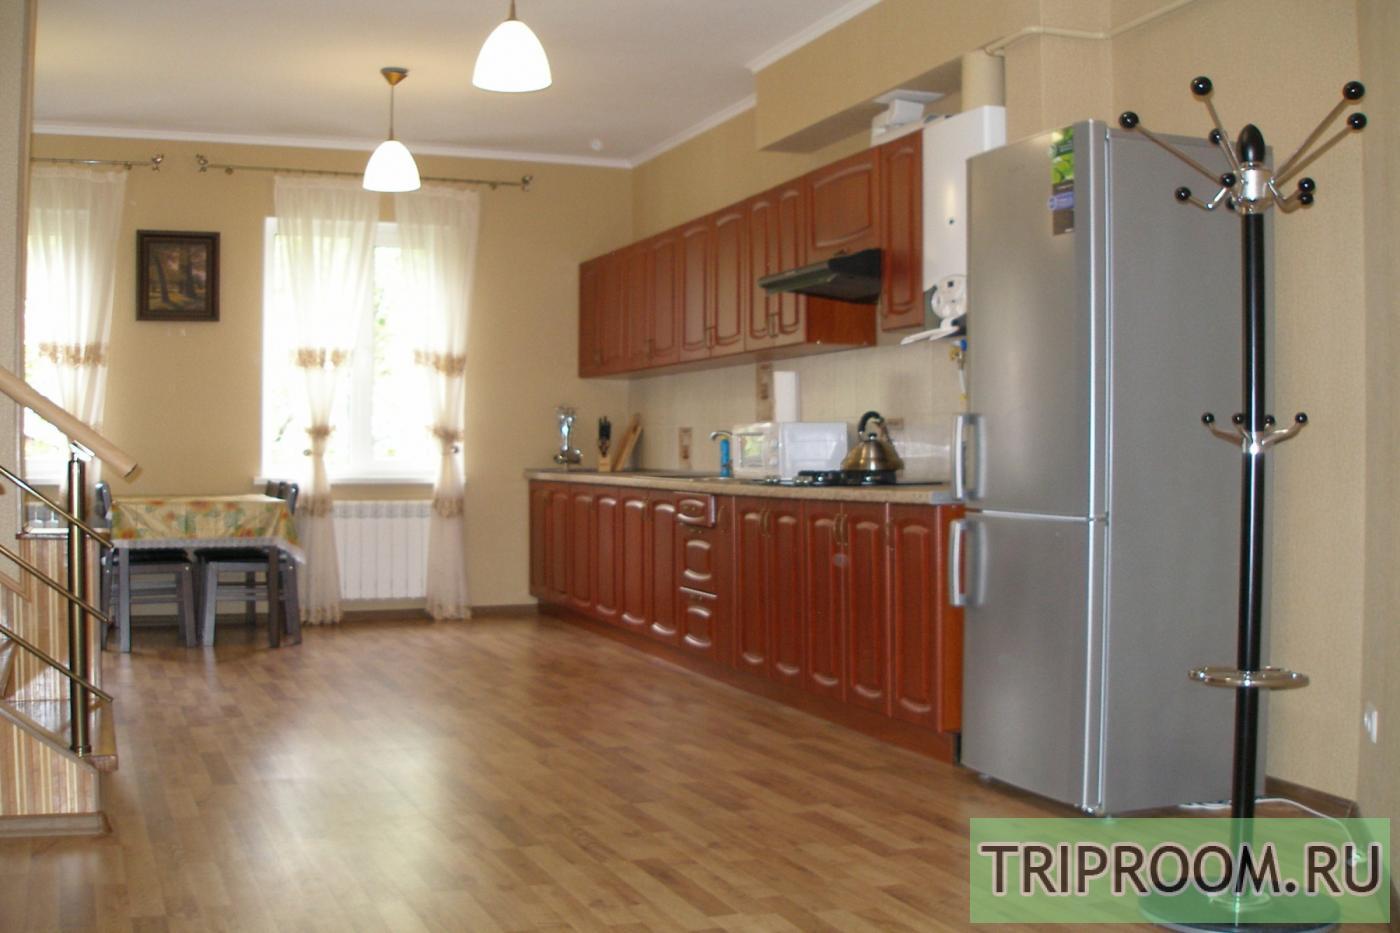 3-комнатная квартира посуточно (вариант № 34537), ул. Чехова улица, фото № 8